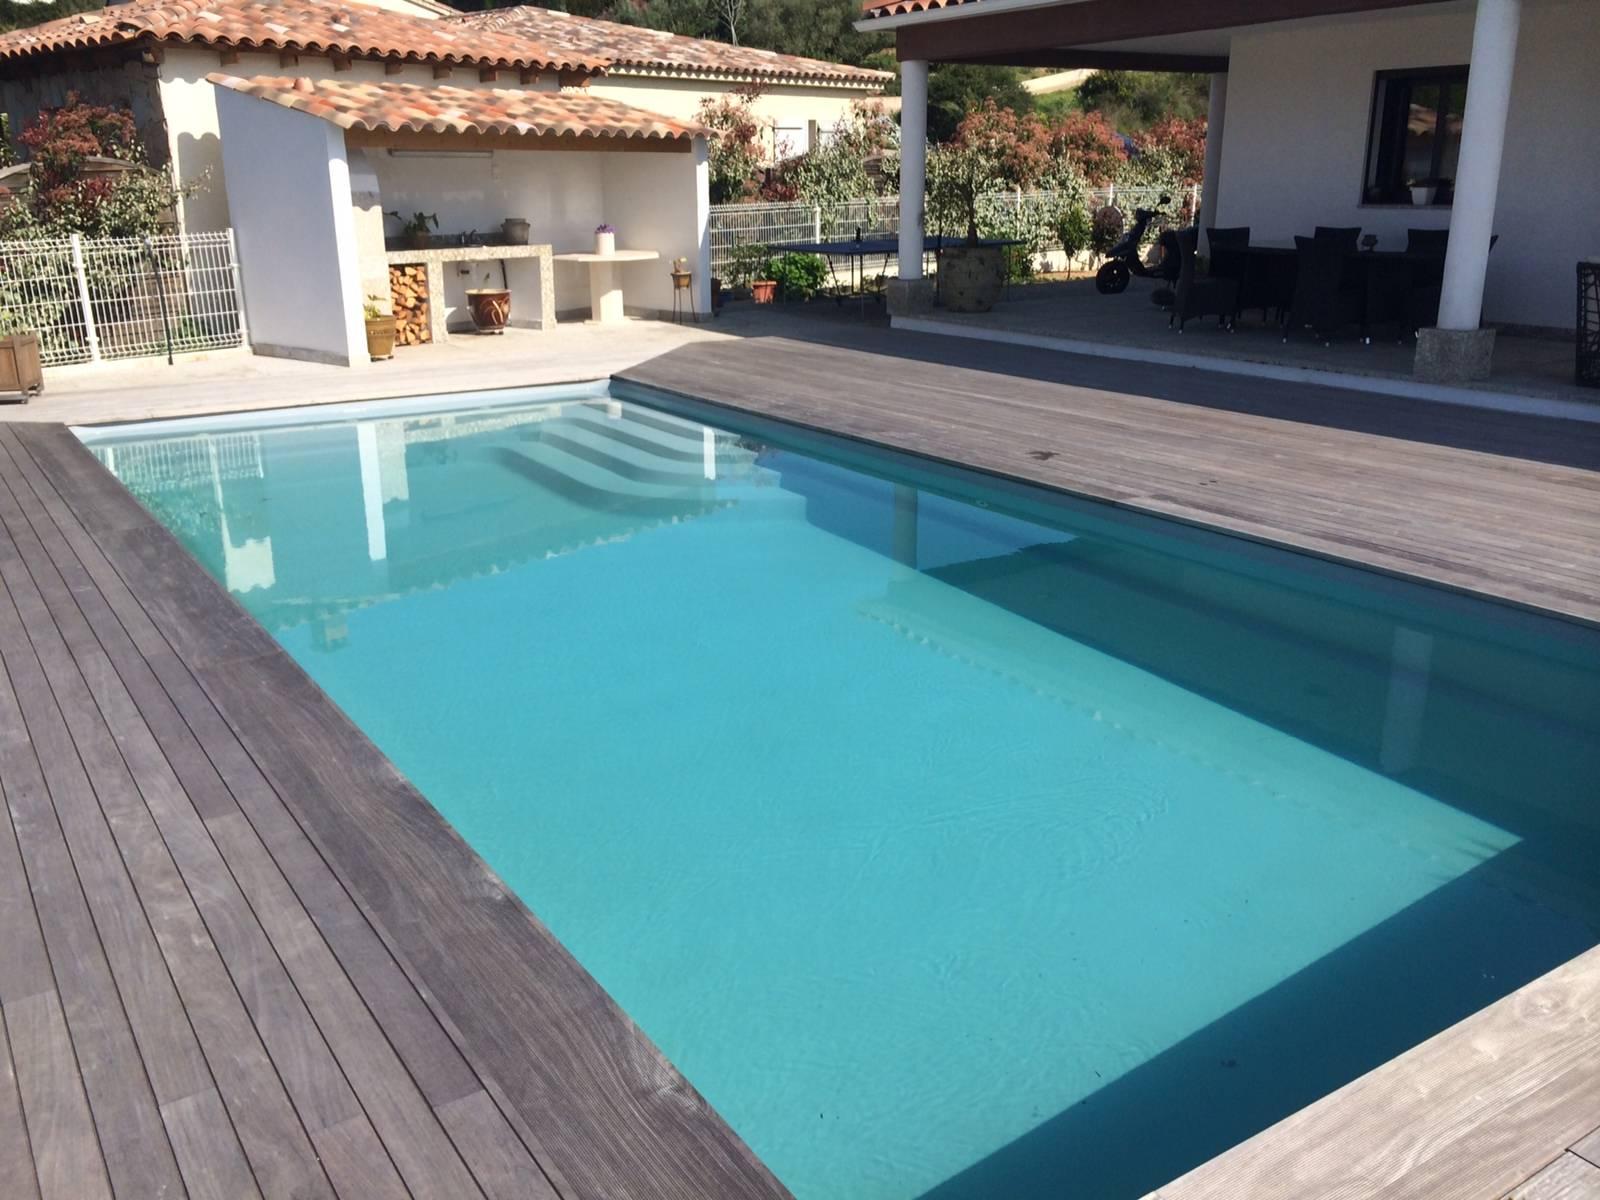 piscine kit coque polyester rectangulaire feroe france piscines composites 8 x 4 la. Black Bedroom Furniture Sets. Home Design Ideas